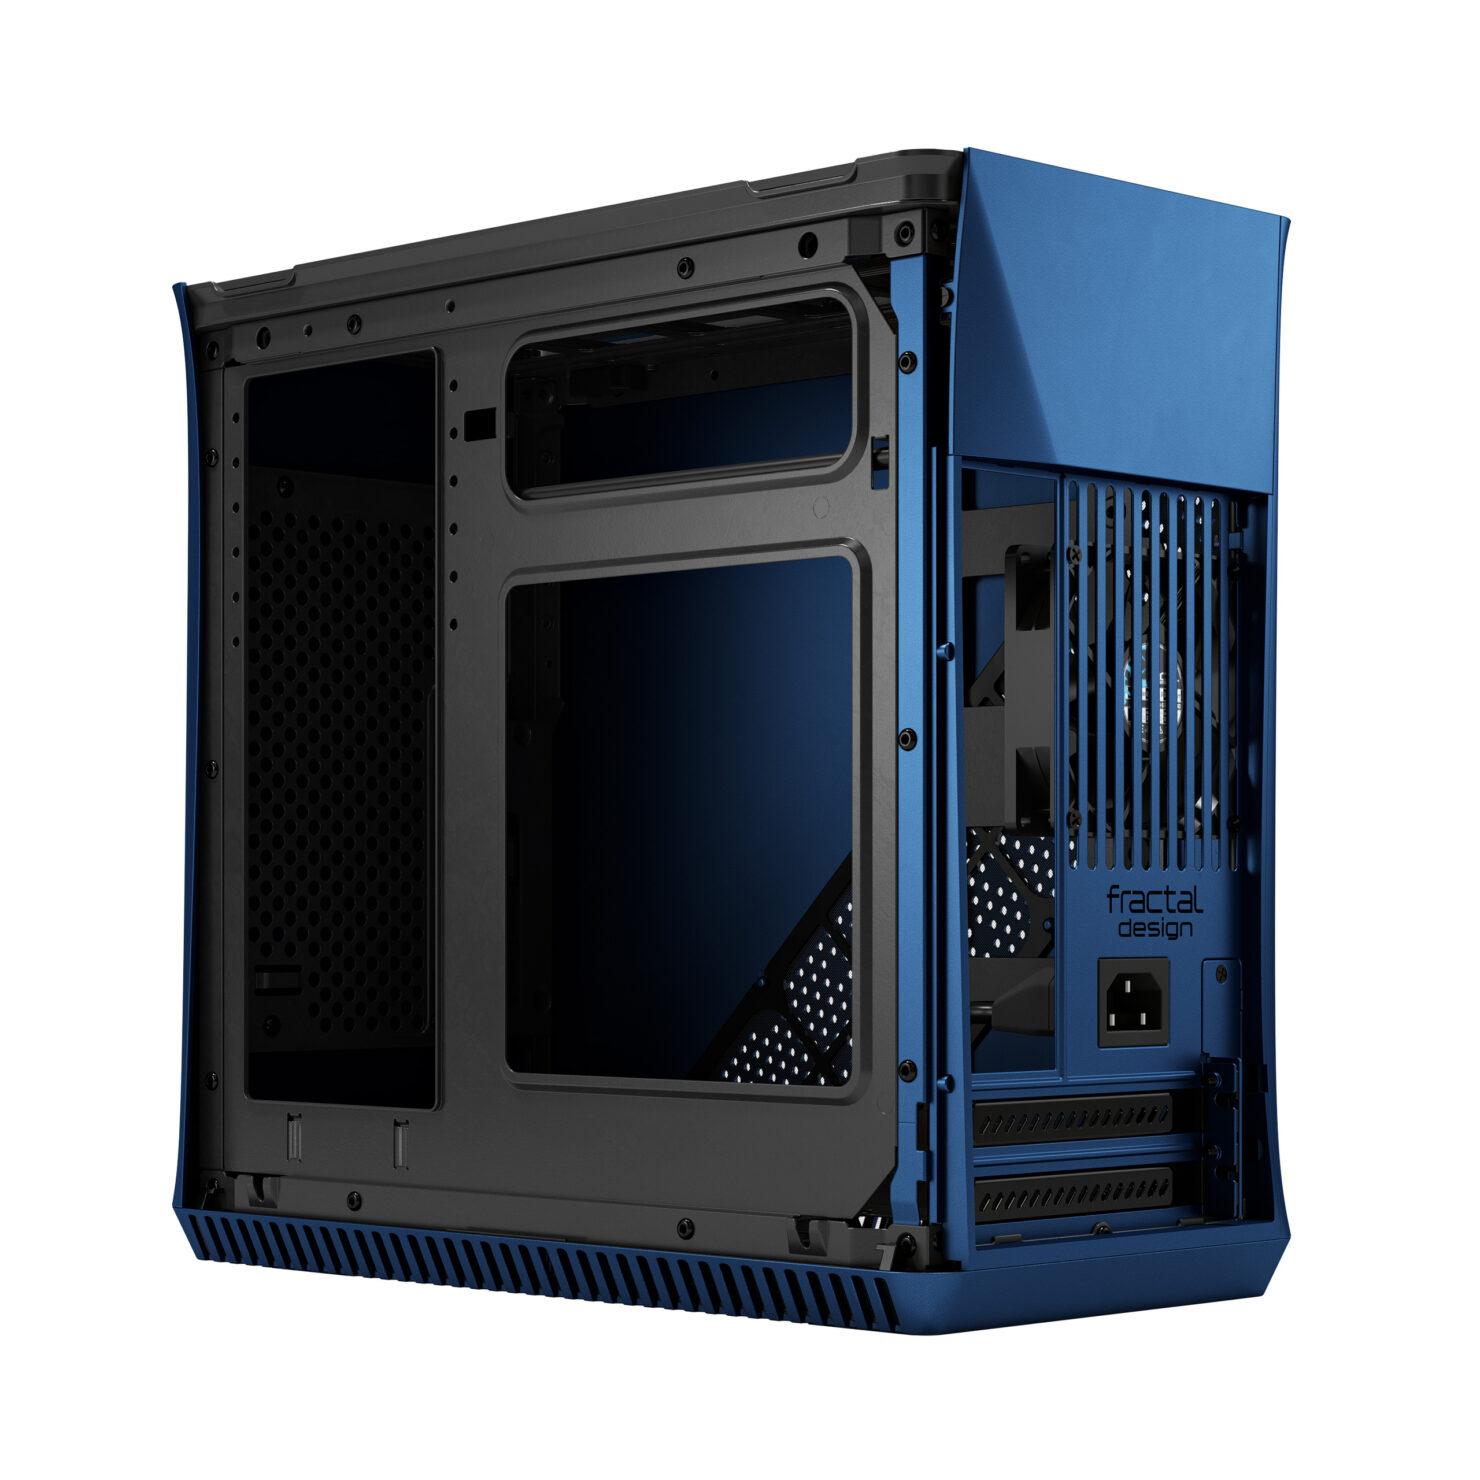 eraitx_iso_below_left_back_open_product_blue